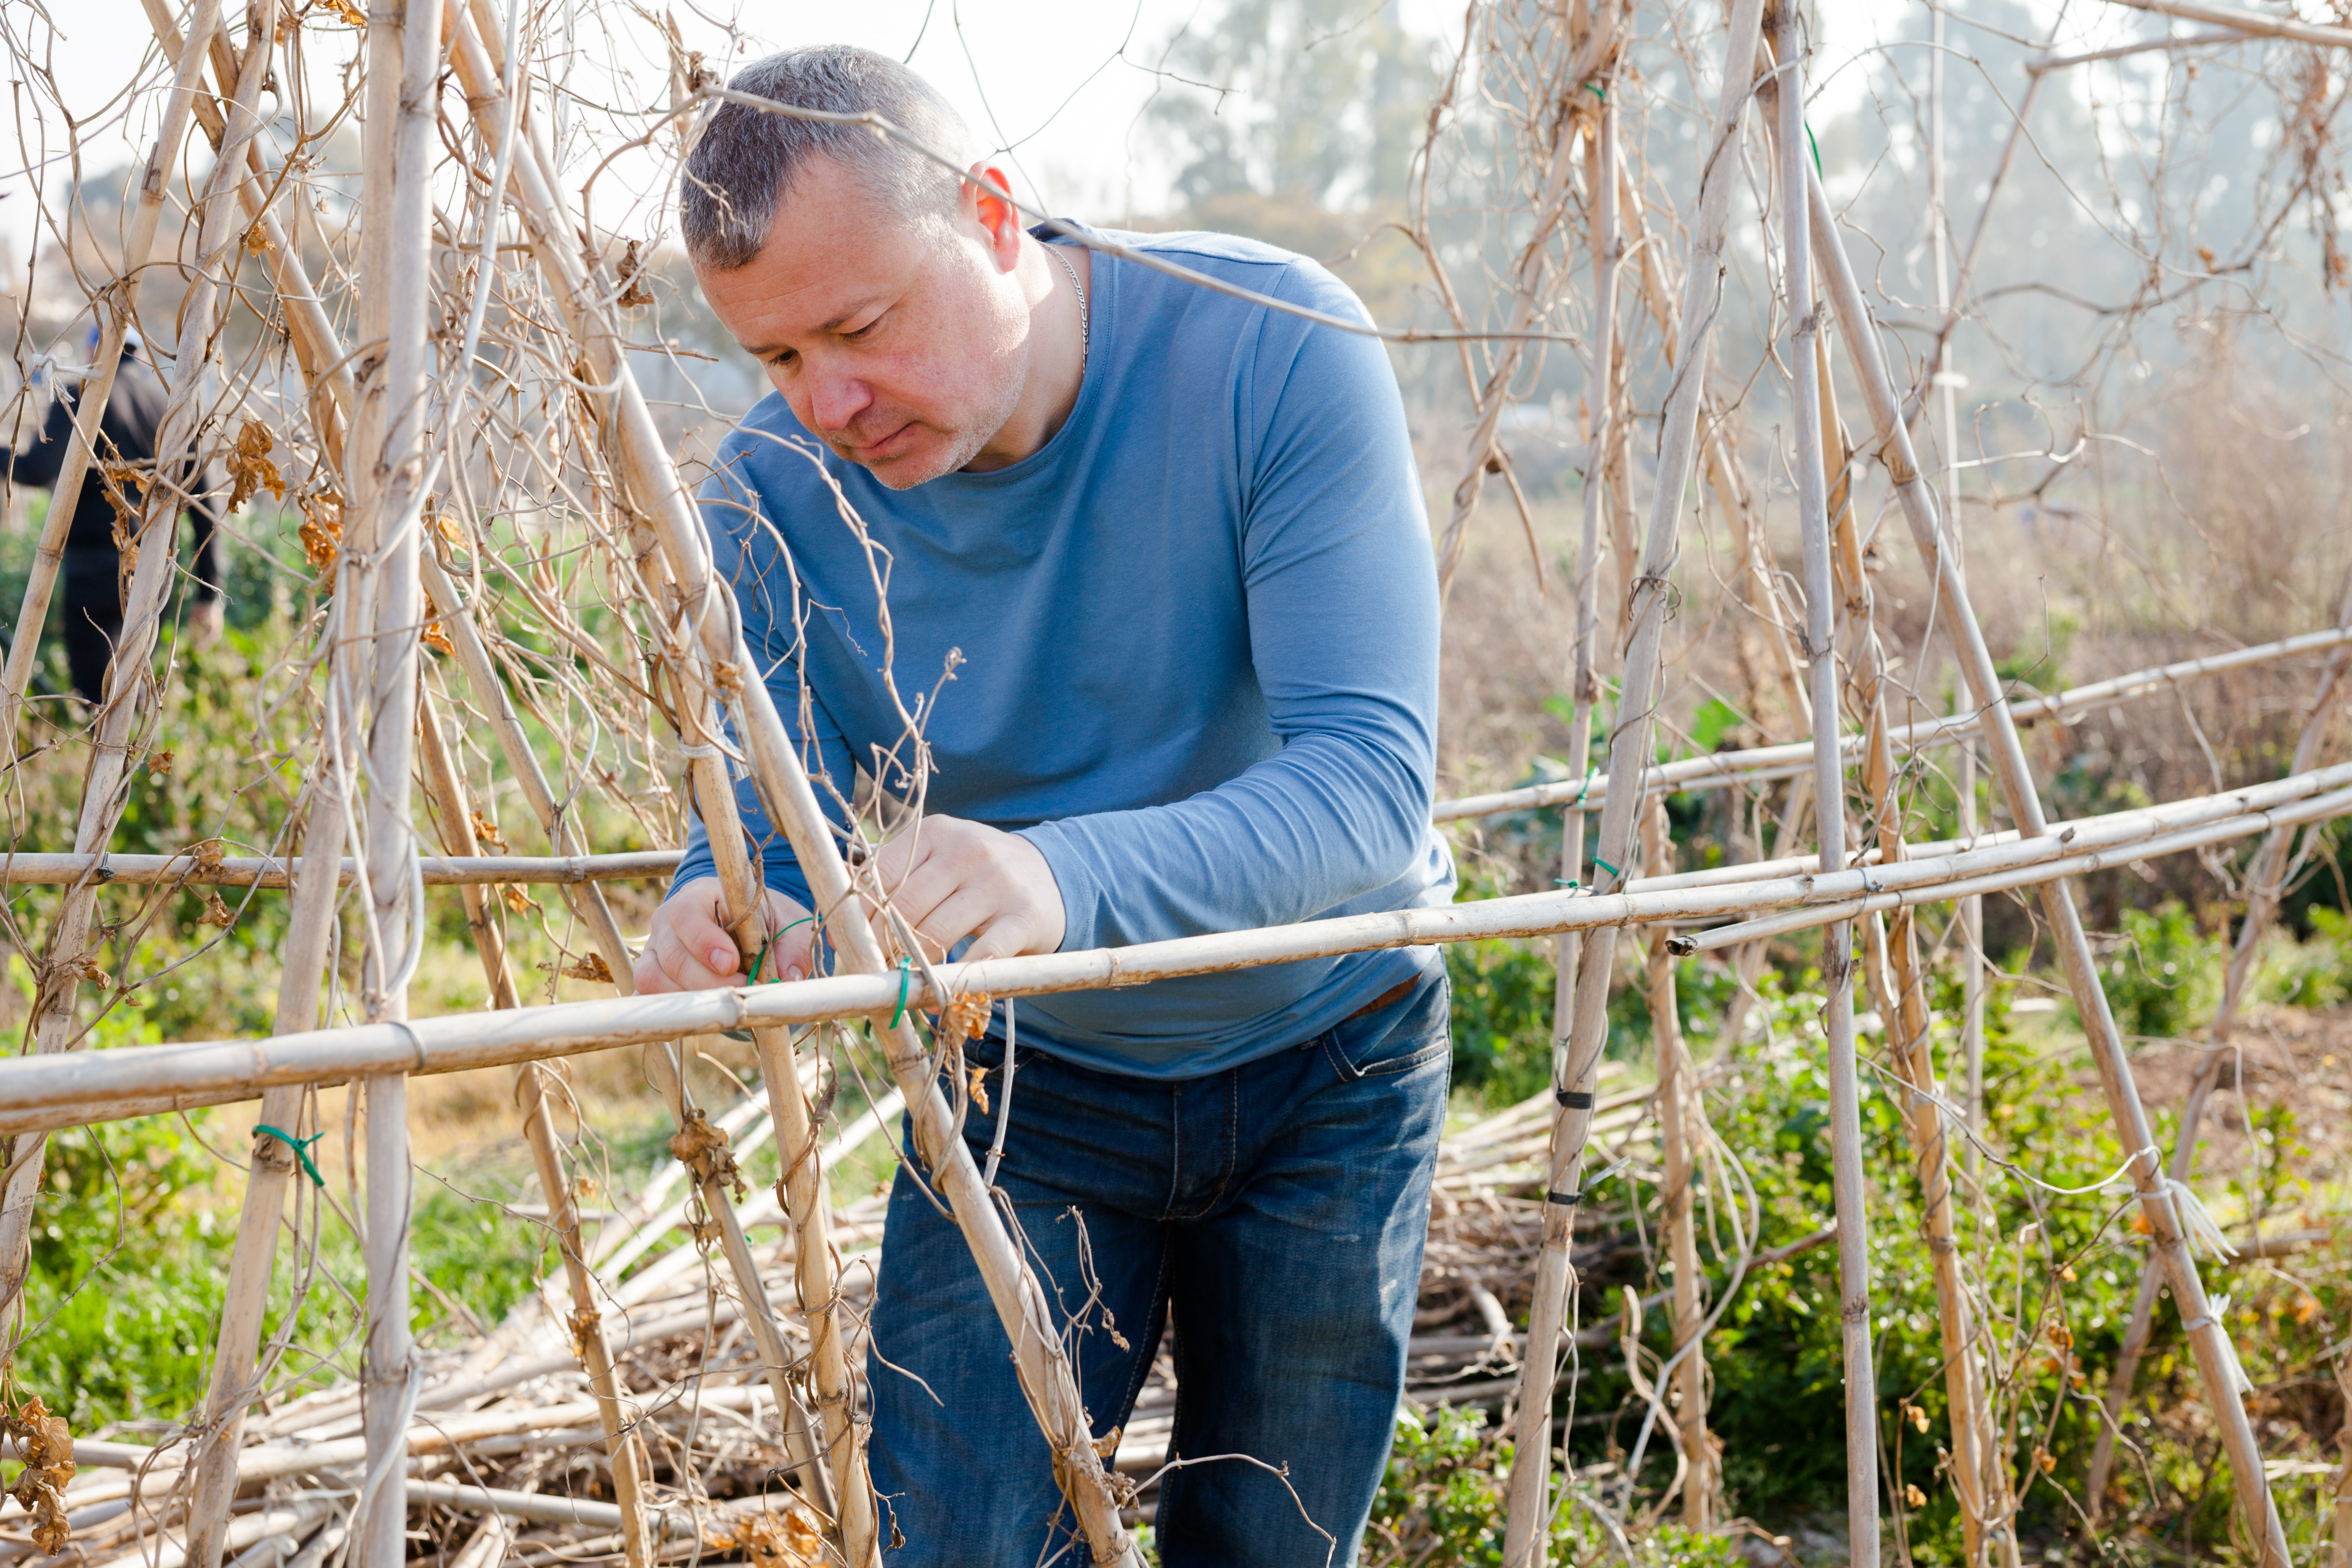 Male horticulturist working with wooden girders in  garden outdoor